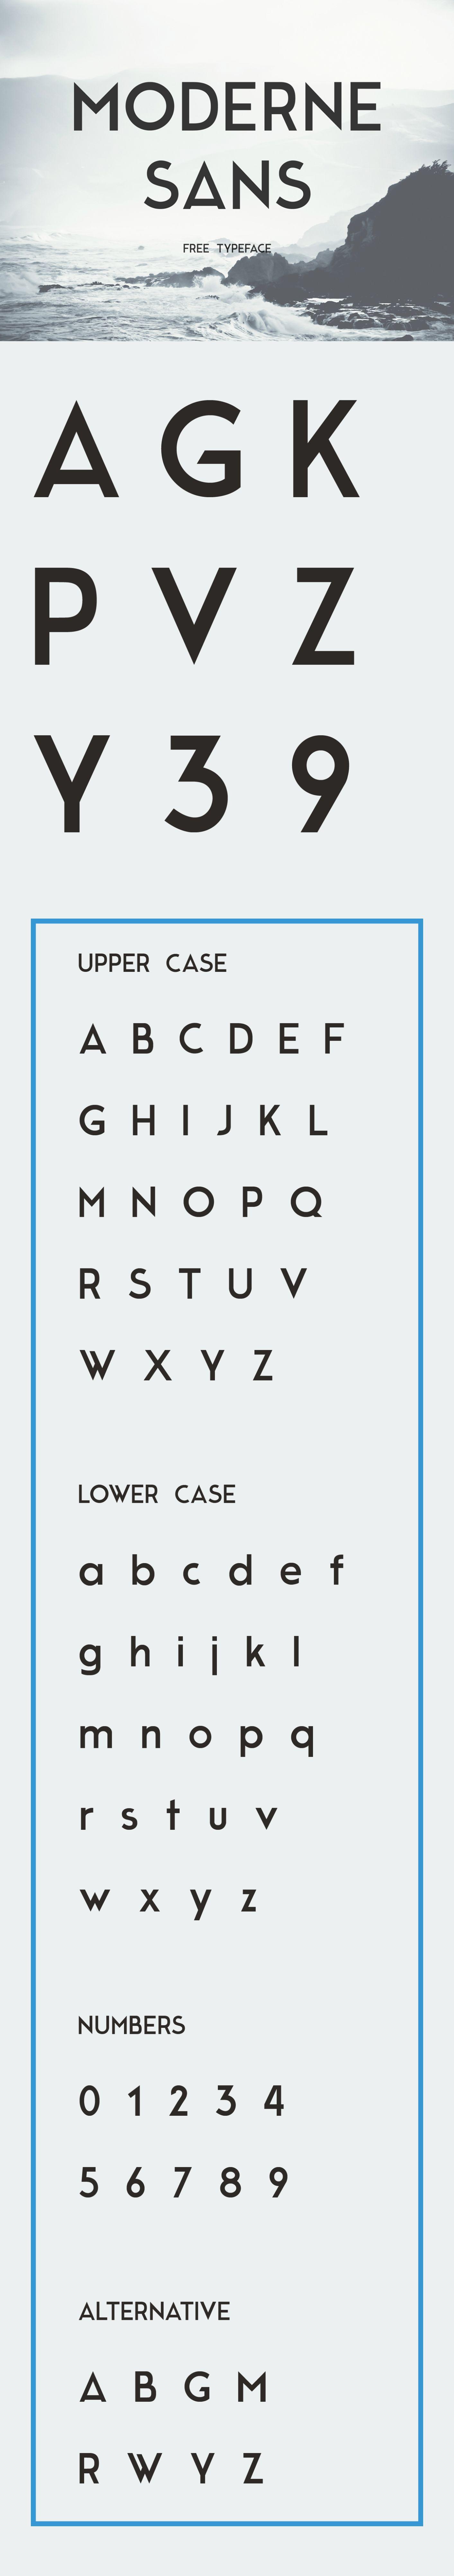 Moderne Sans - Free Typeface on Behance